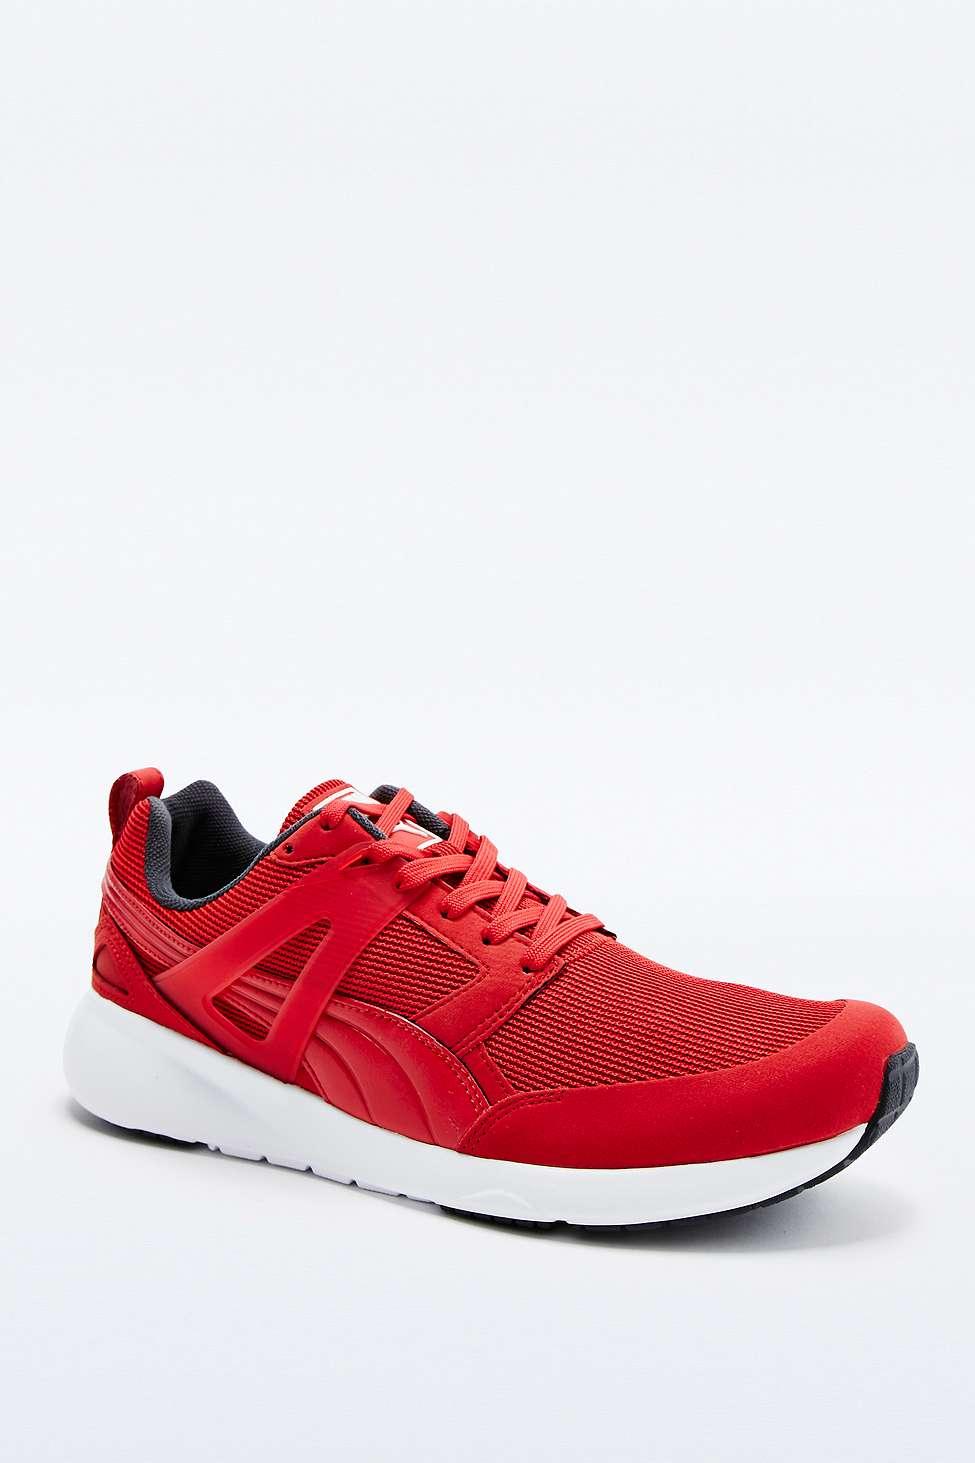 redx1.jpeg